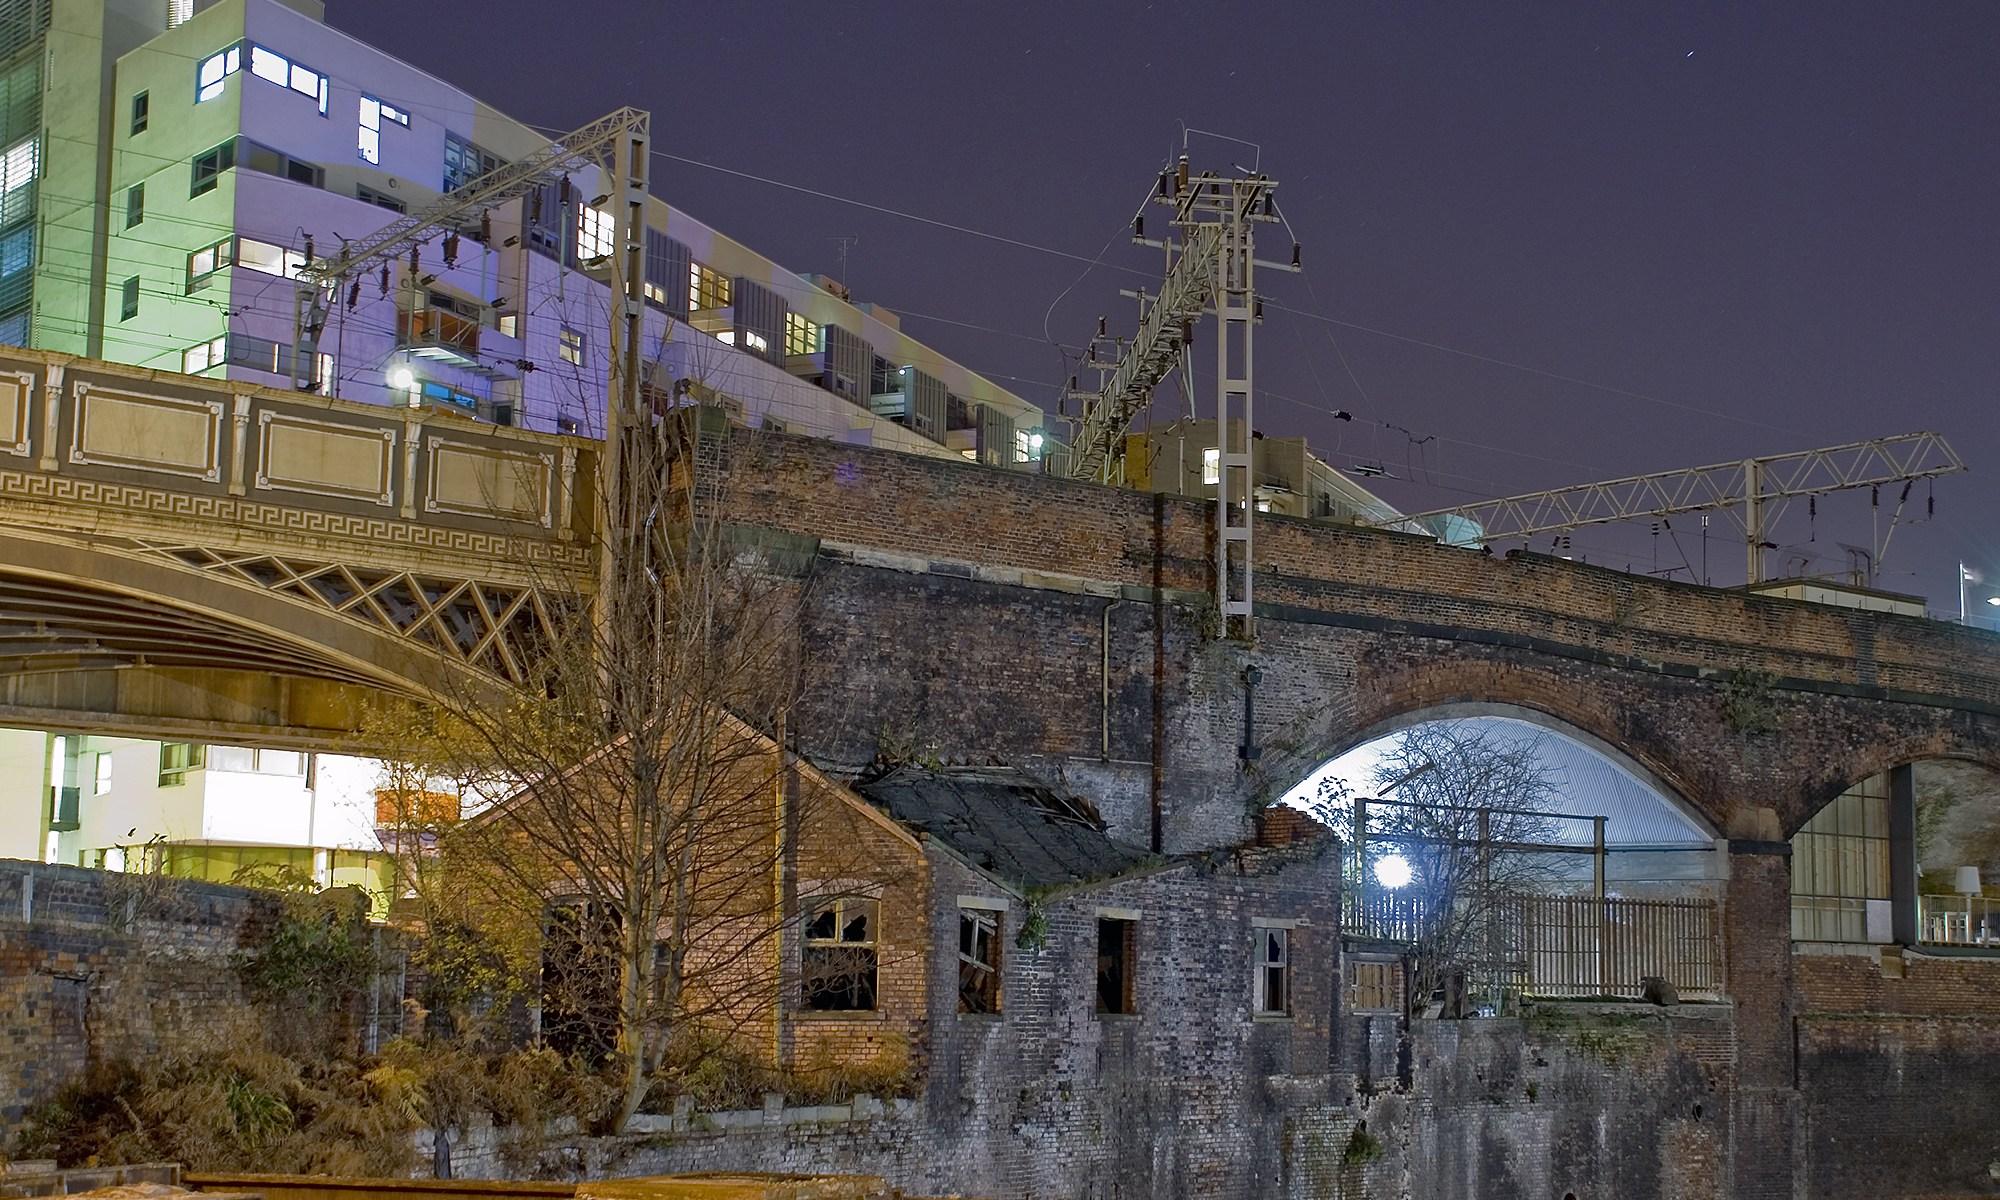 Derelict Building below Oxford Rd Station